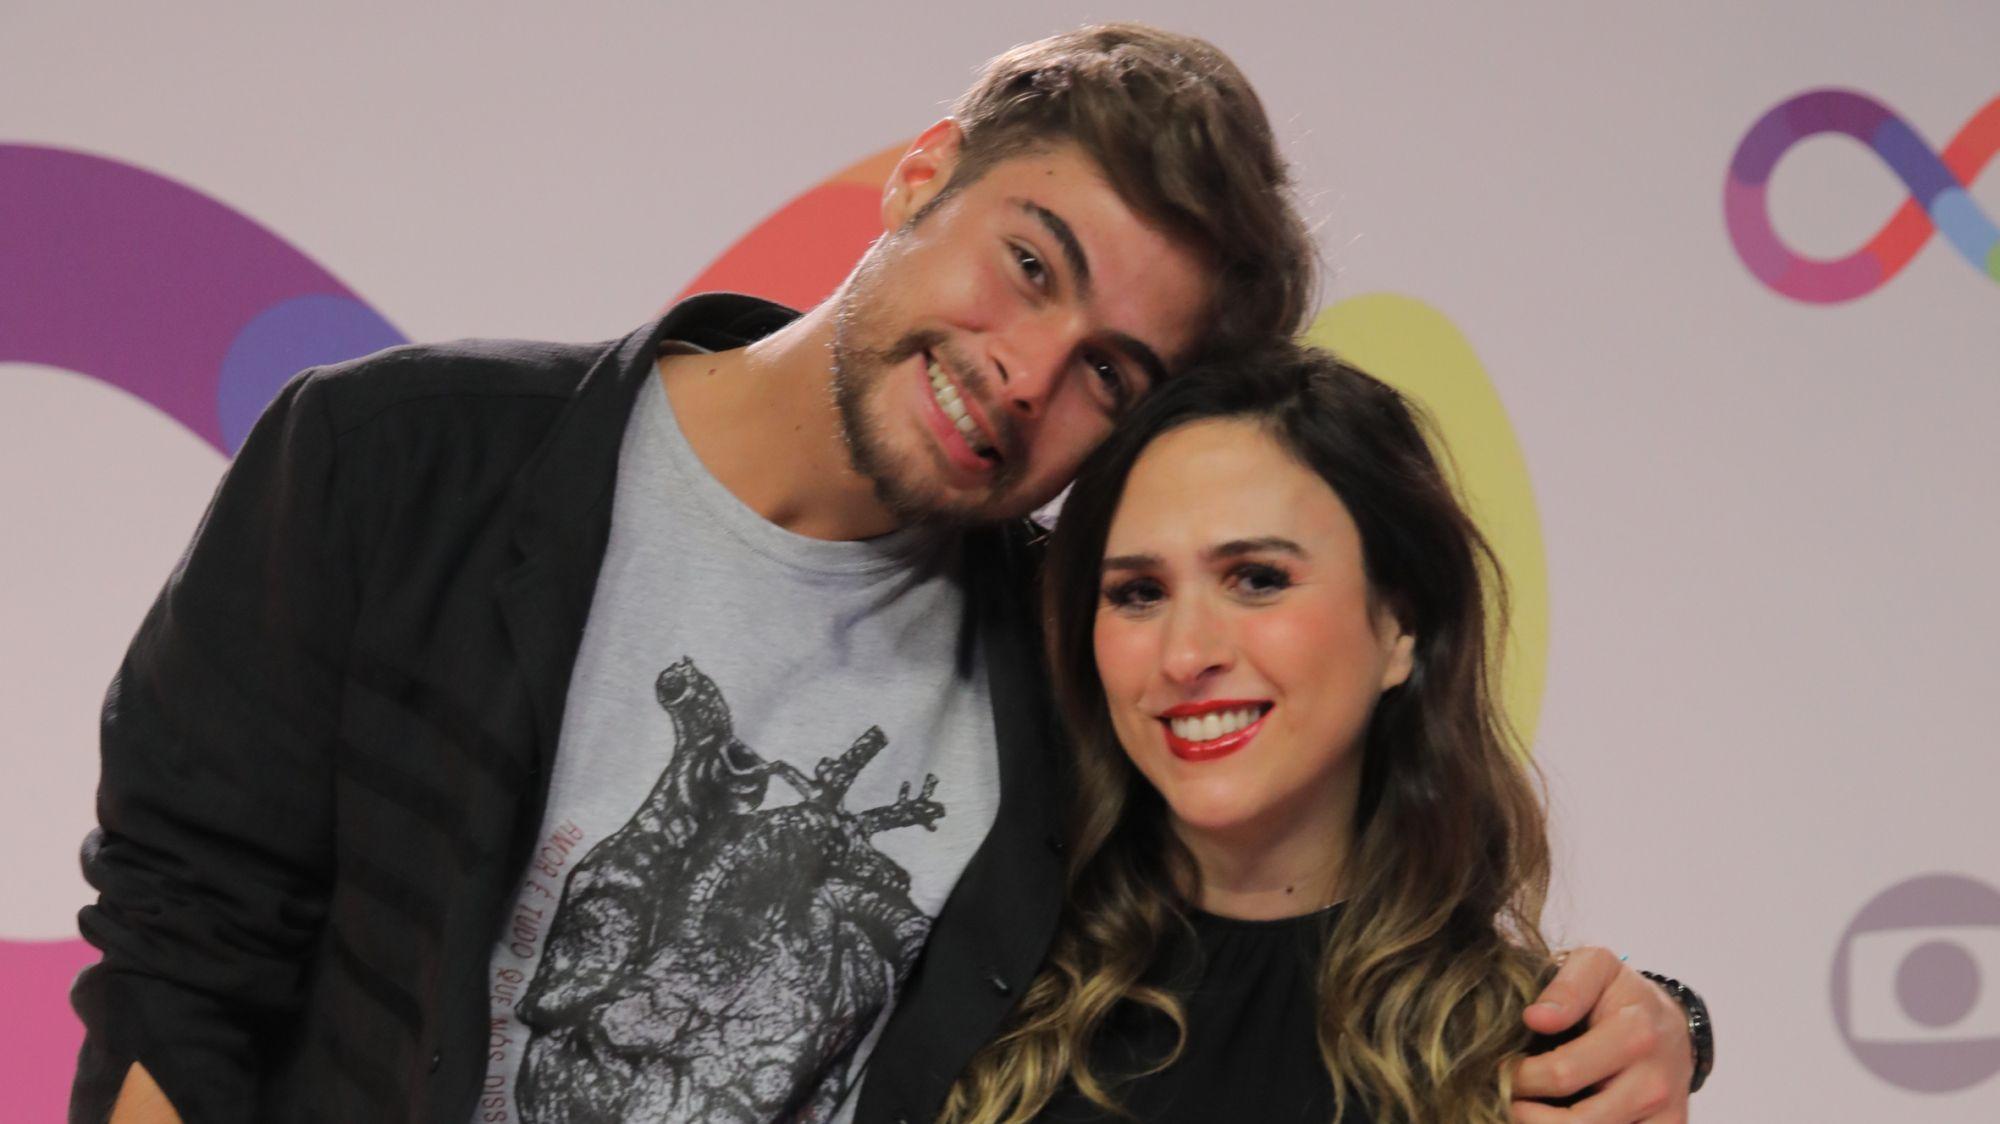 Filha de Tatá Werneck e Rafael Vitti, Clara Maria ganha festa de atores: '1 mês' | Tatá werneck, Rafael vitti, Werneck